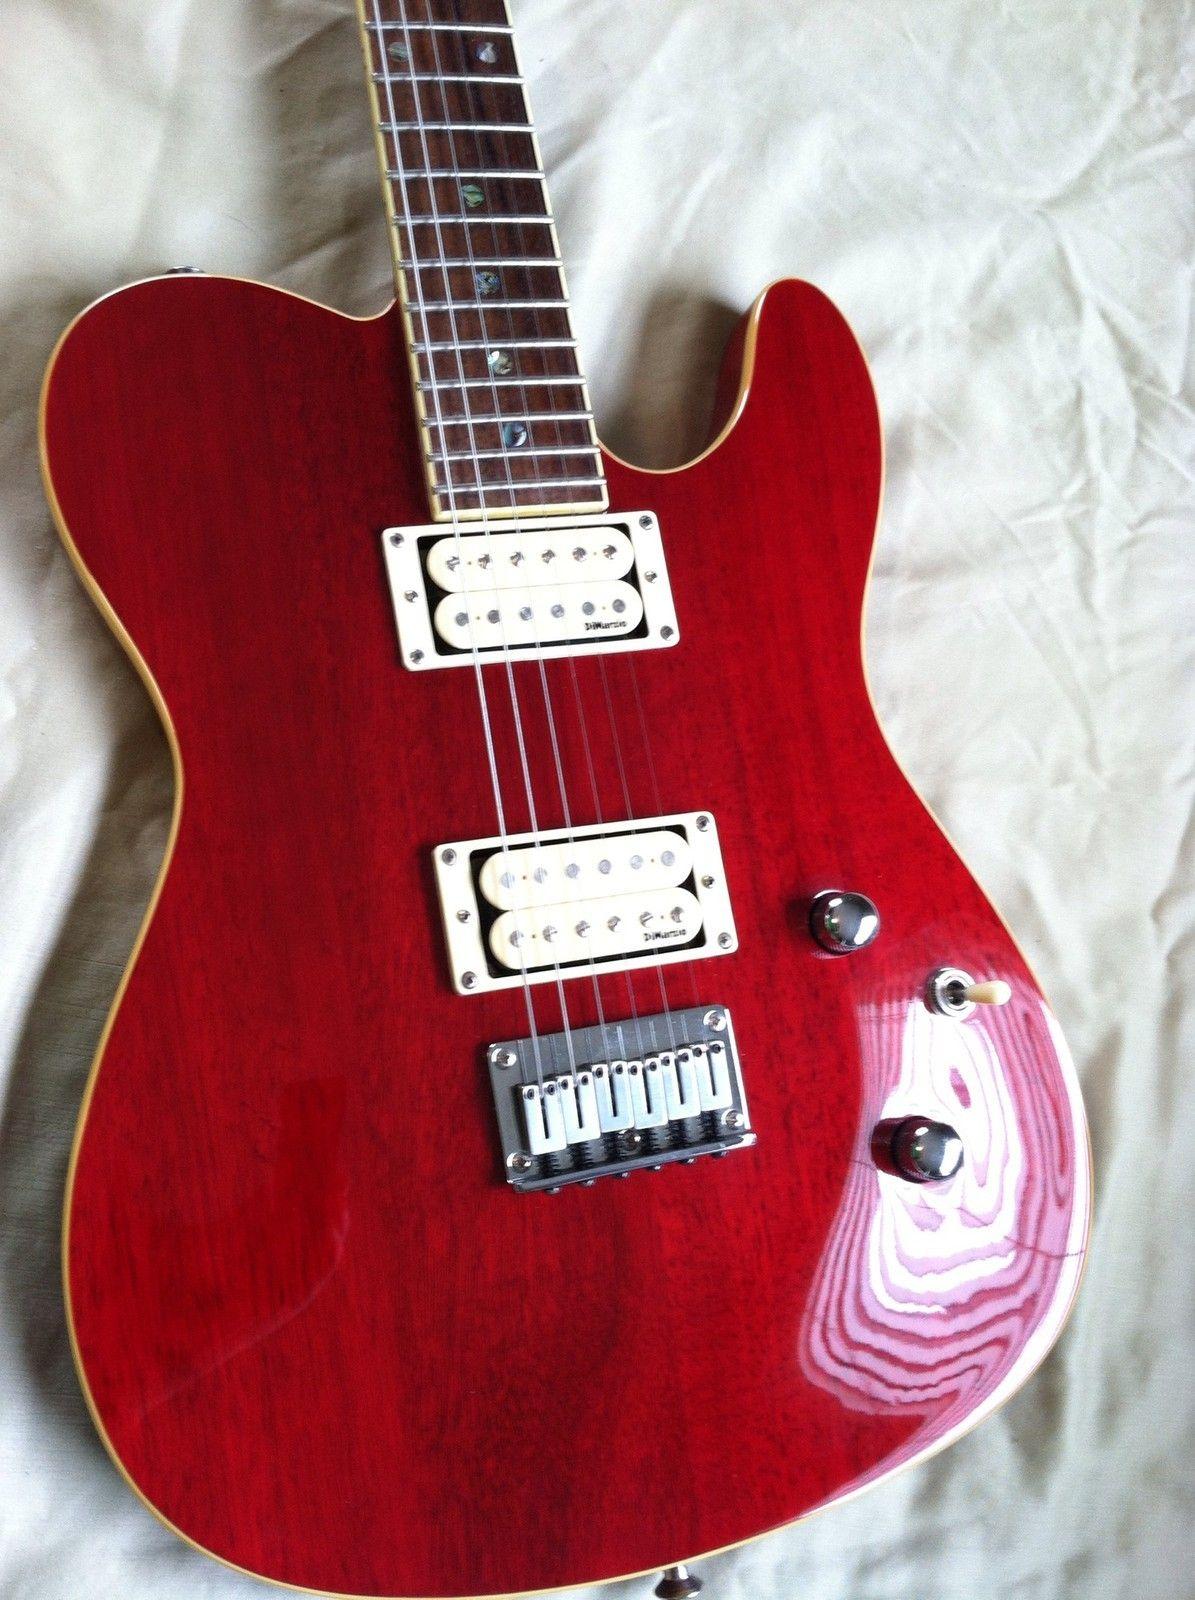 fender telecaster hh wine red w binding dimarzio guitars in 2019 fender telecaster guitar. Black Bedroom Furniture Sets. Home Design Ideas